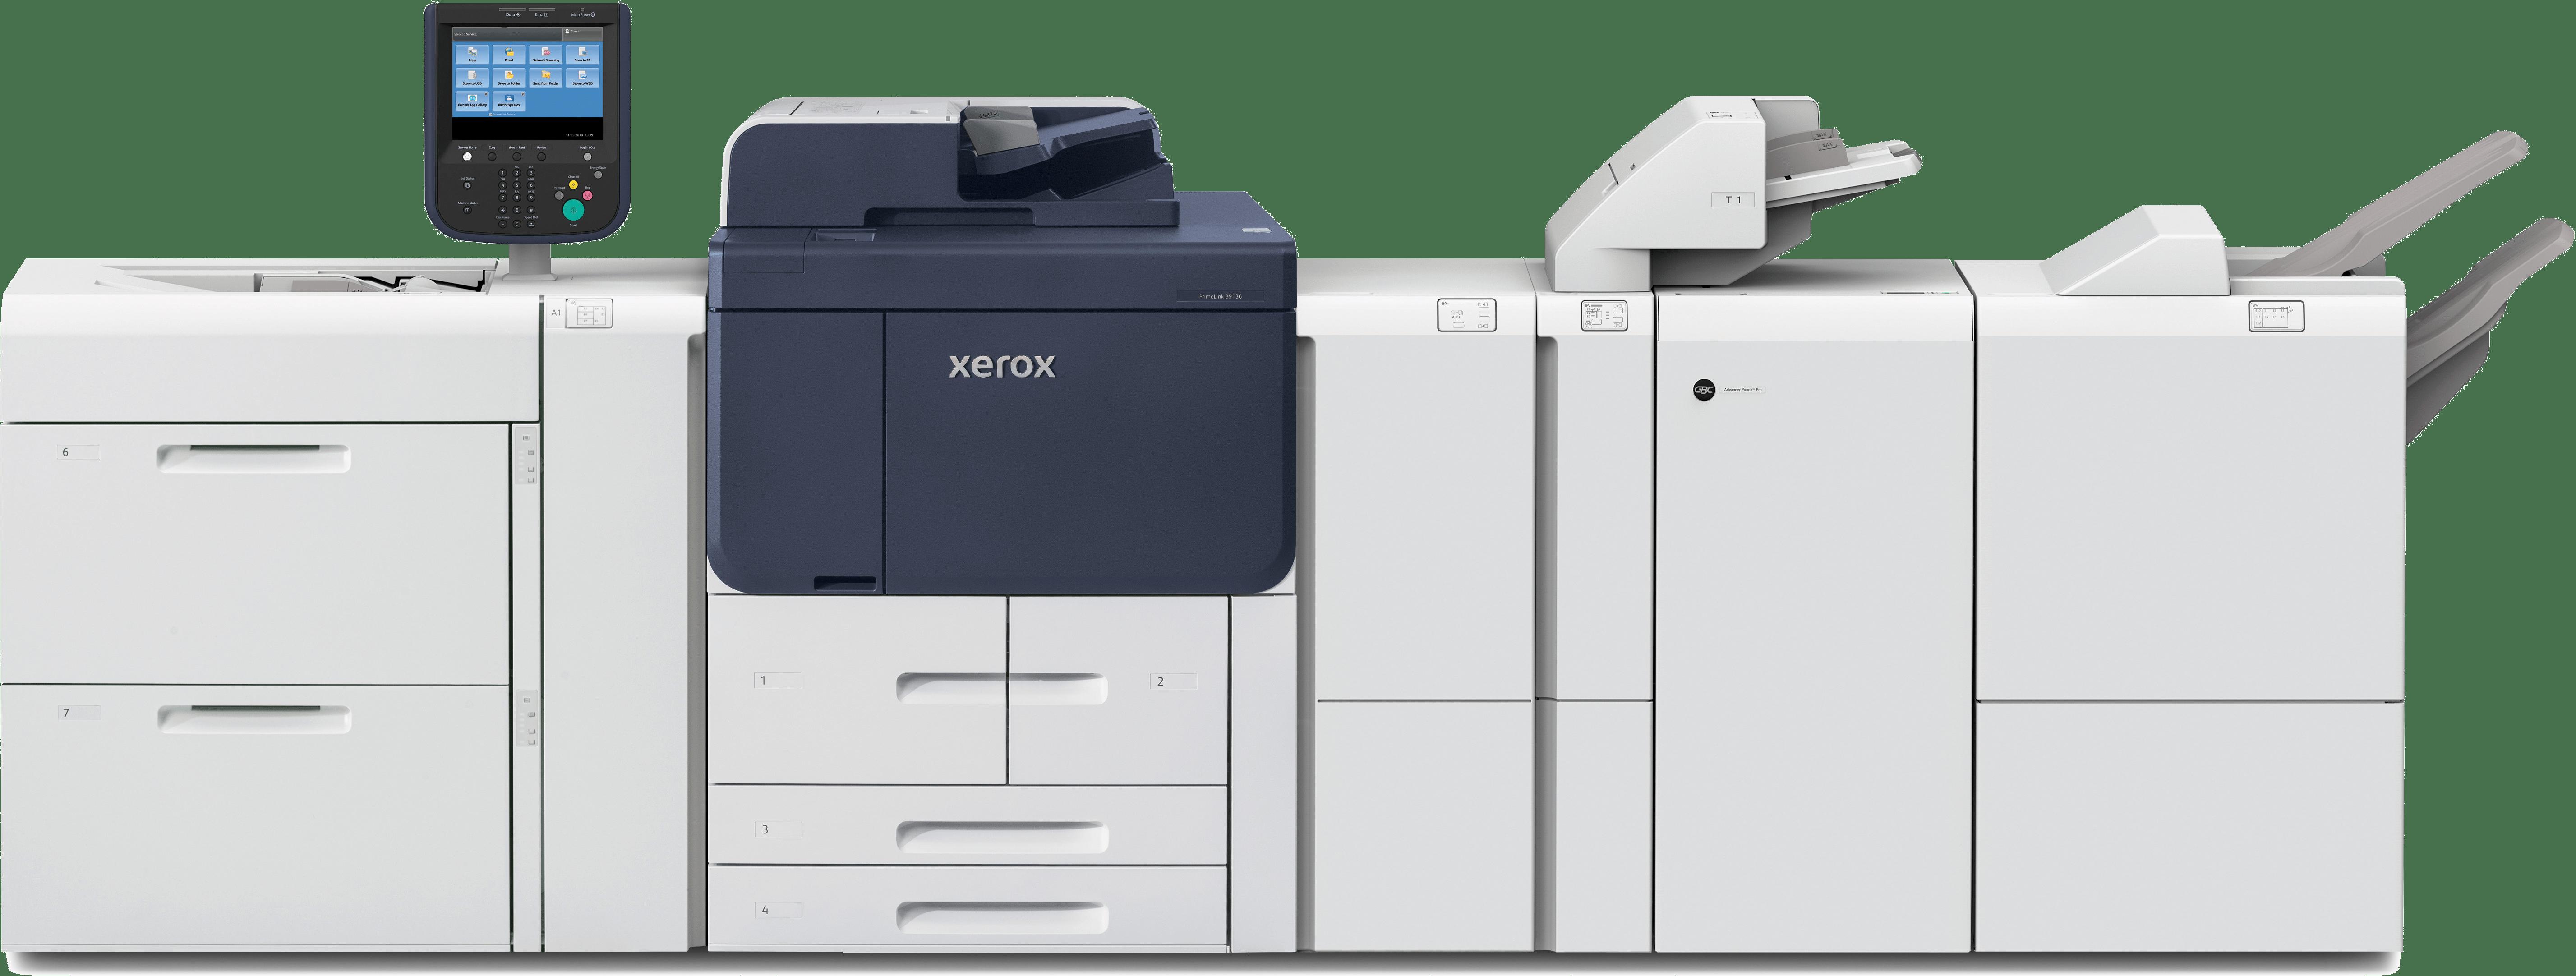 Xerox PrimeLink B9100 Serie